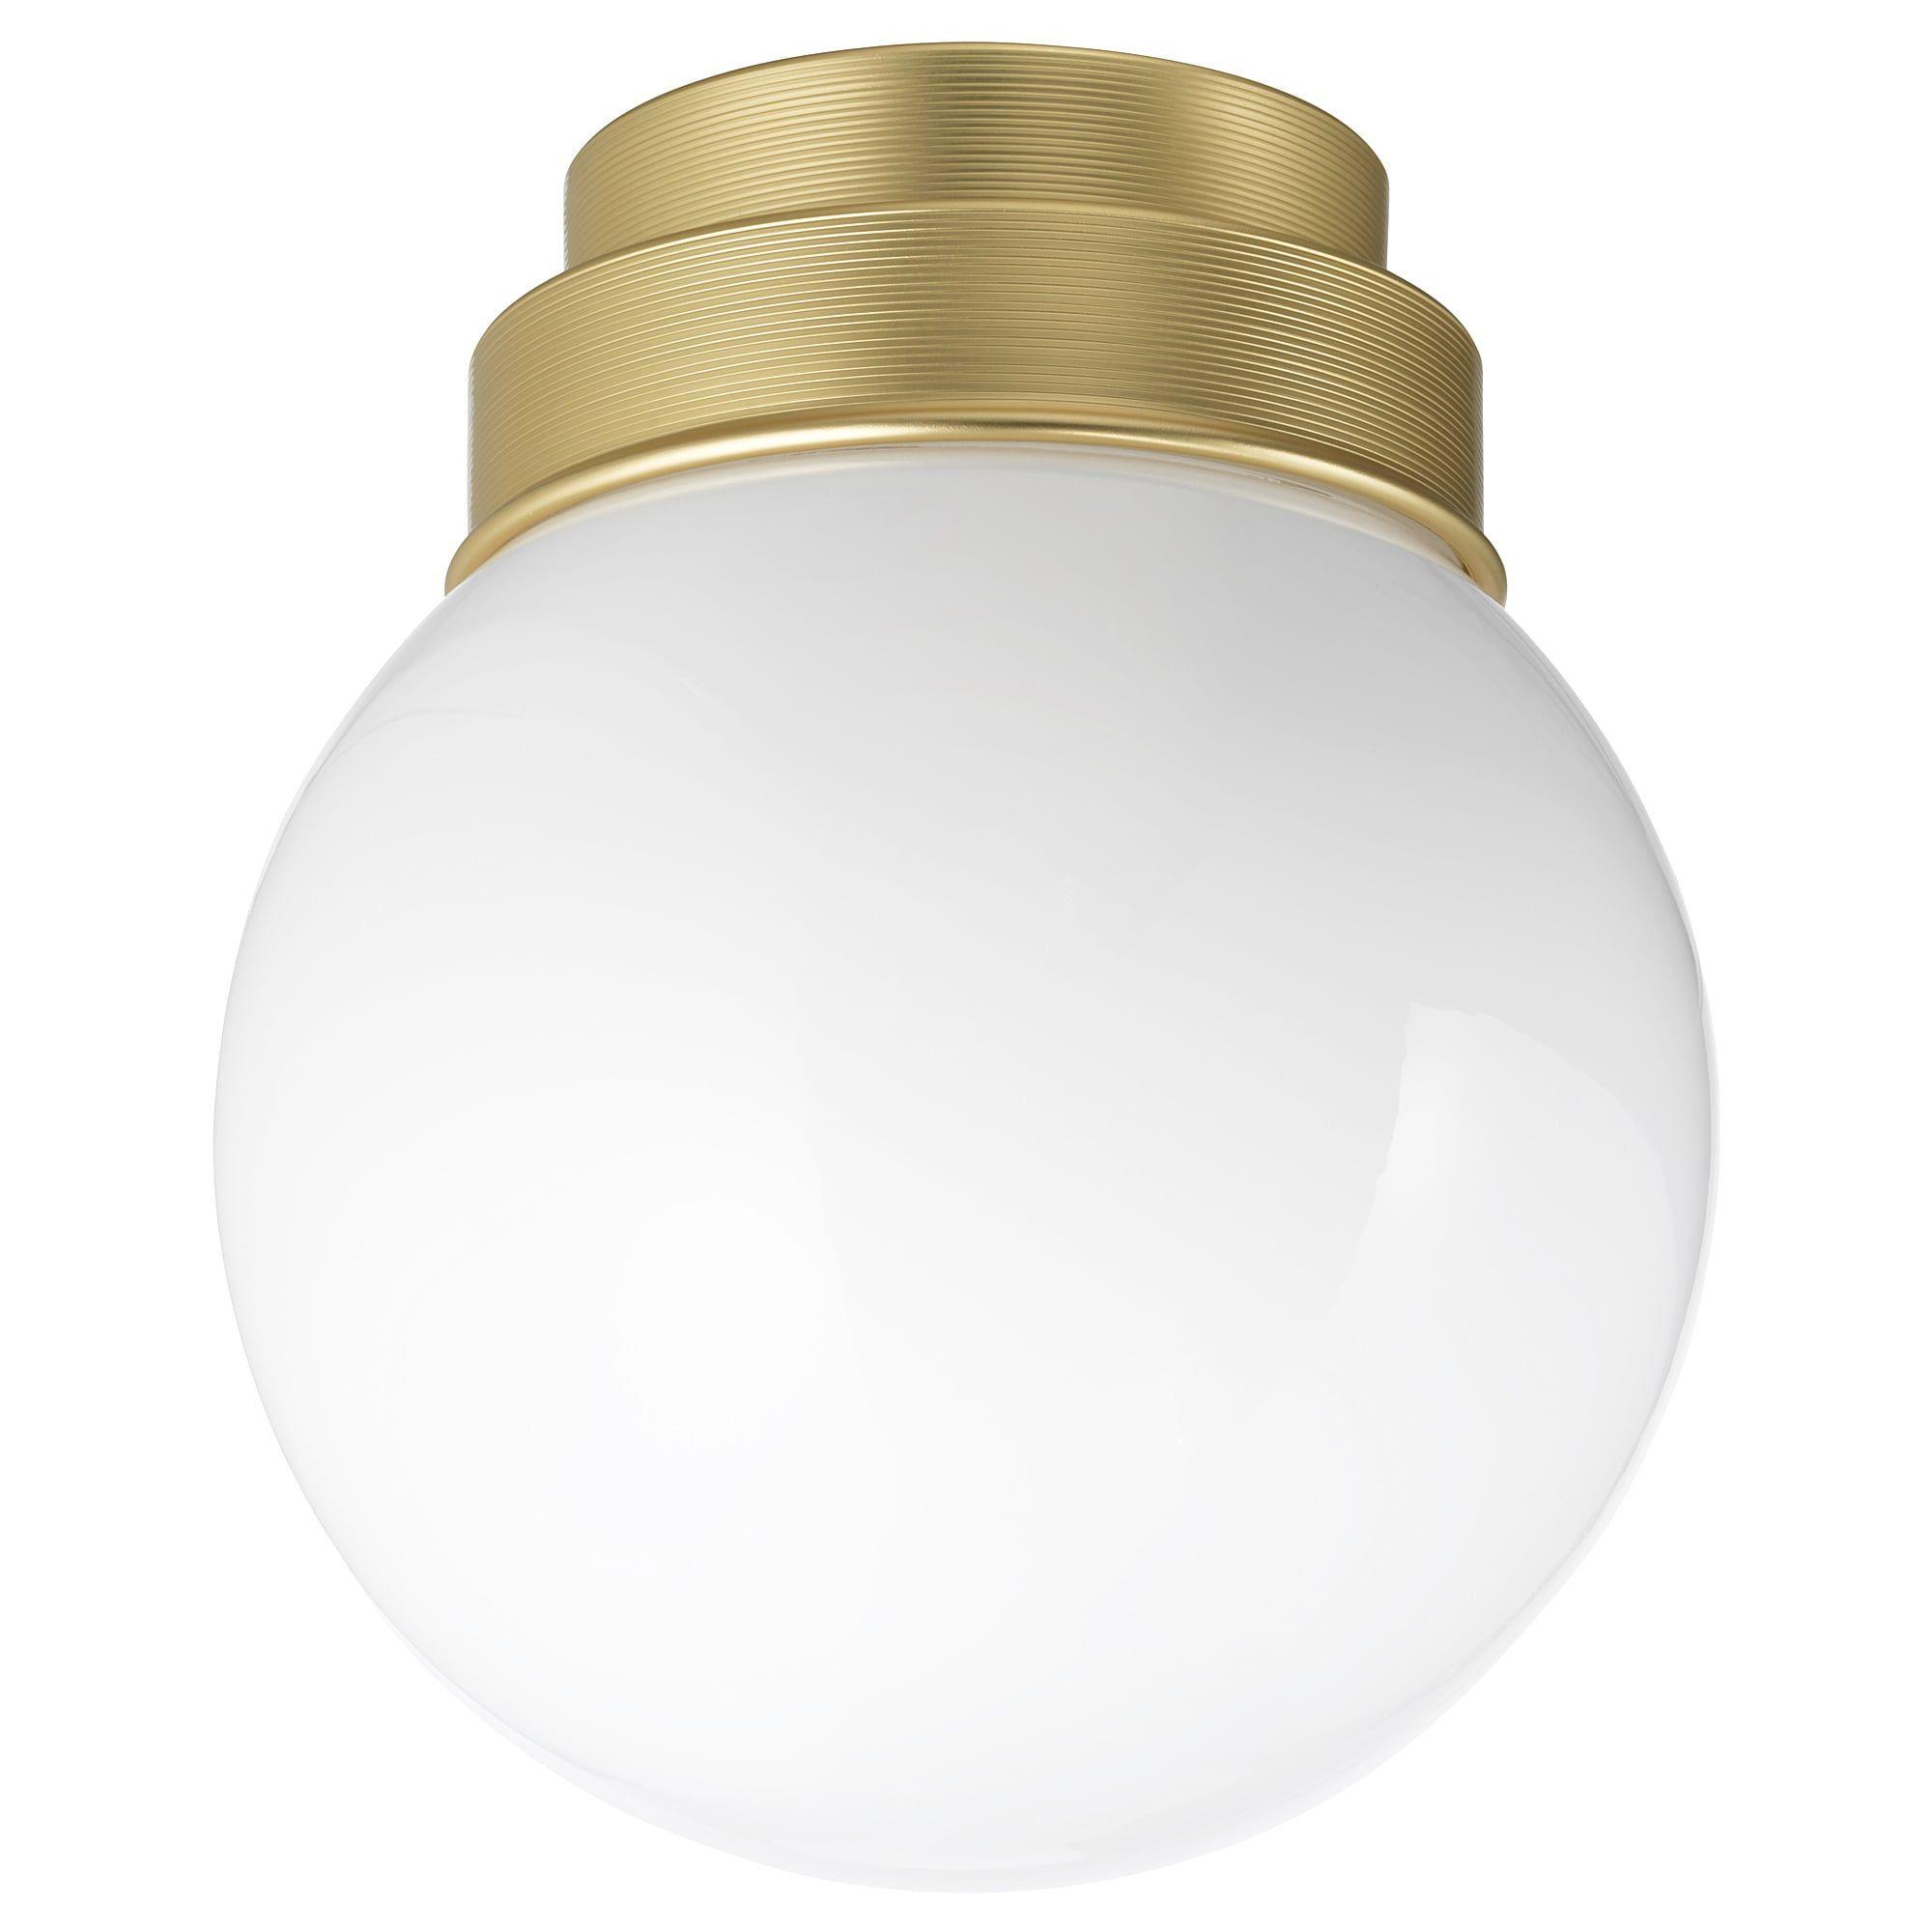 Frihult Plafond Wandlamp Messingkleur Ikea Plafonnier Laiton Luminaire